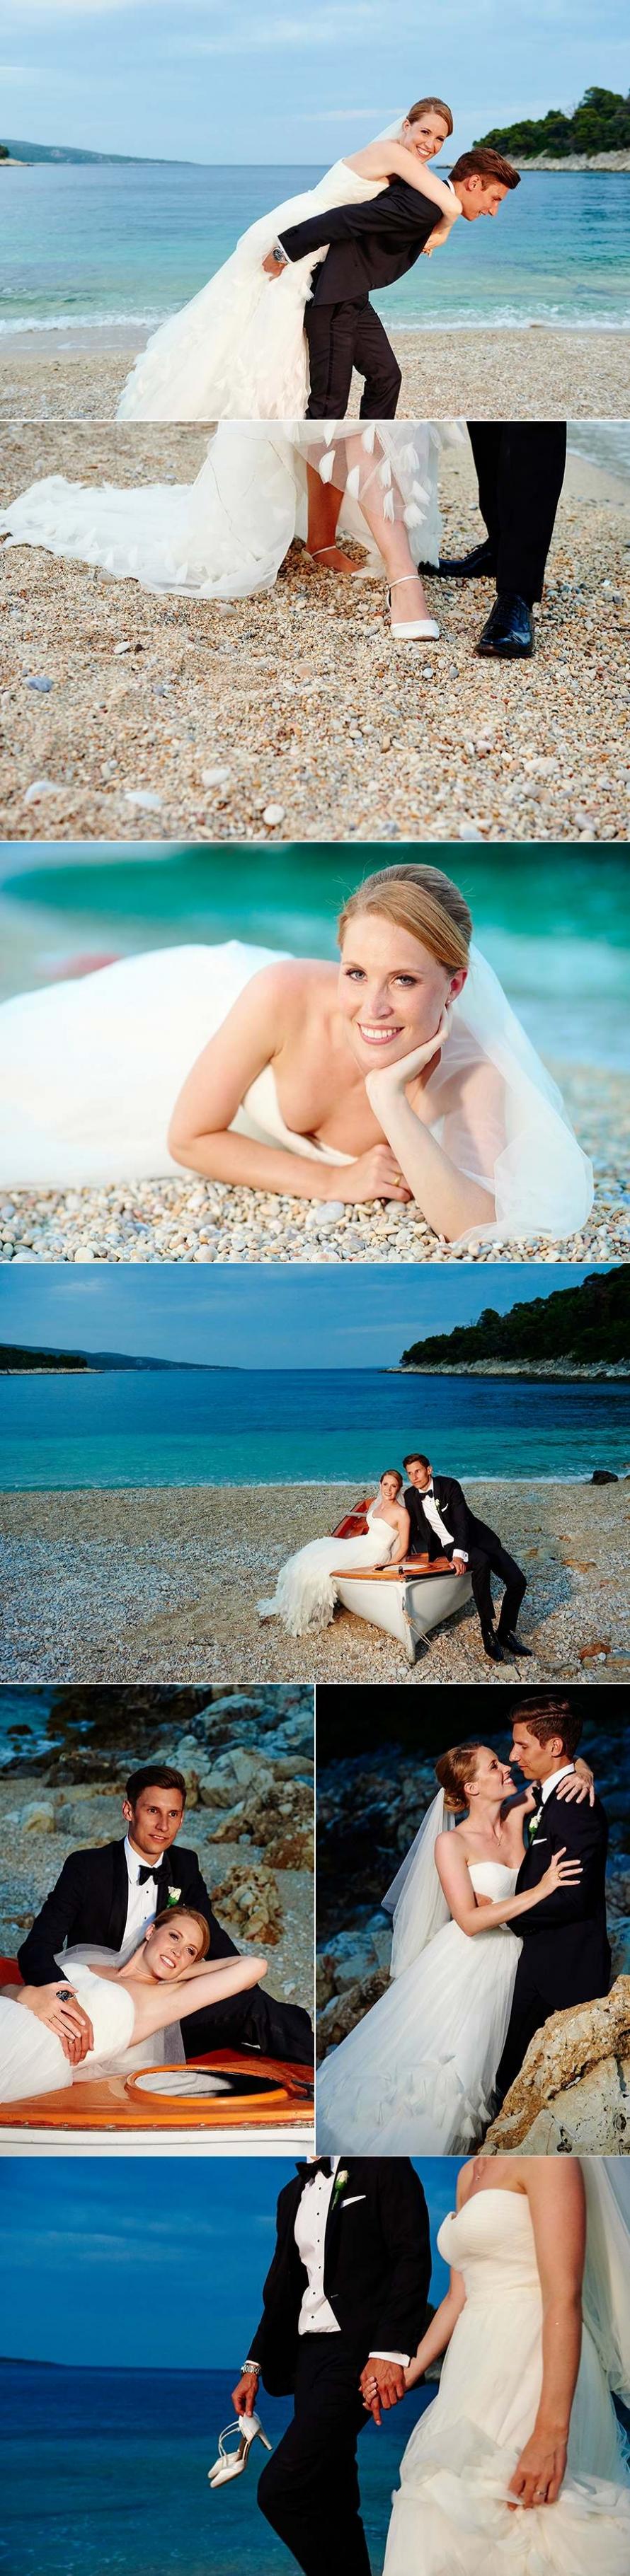 Tobi & Vanessa wedding photos 25